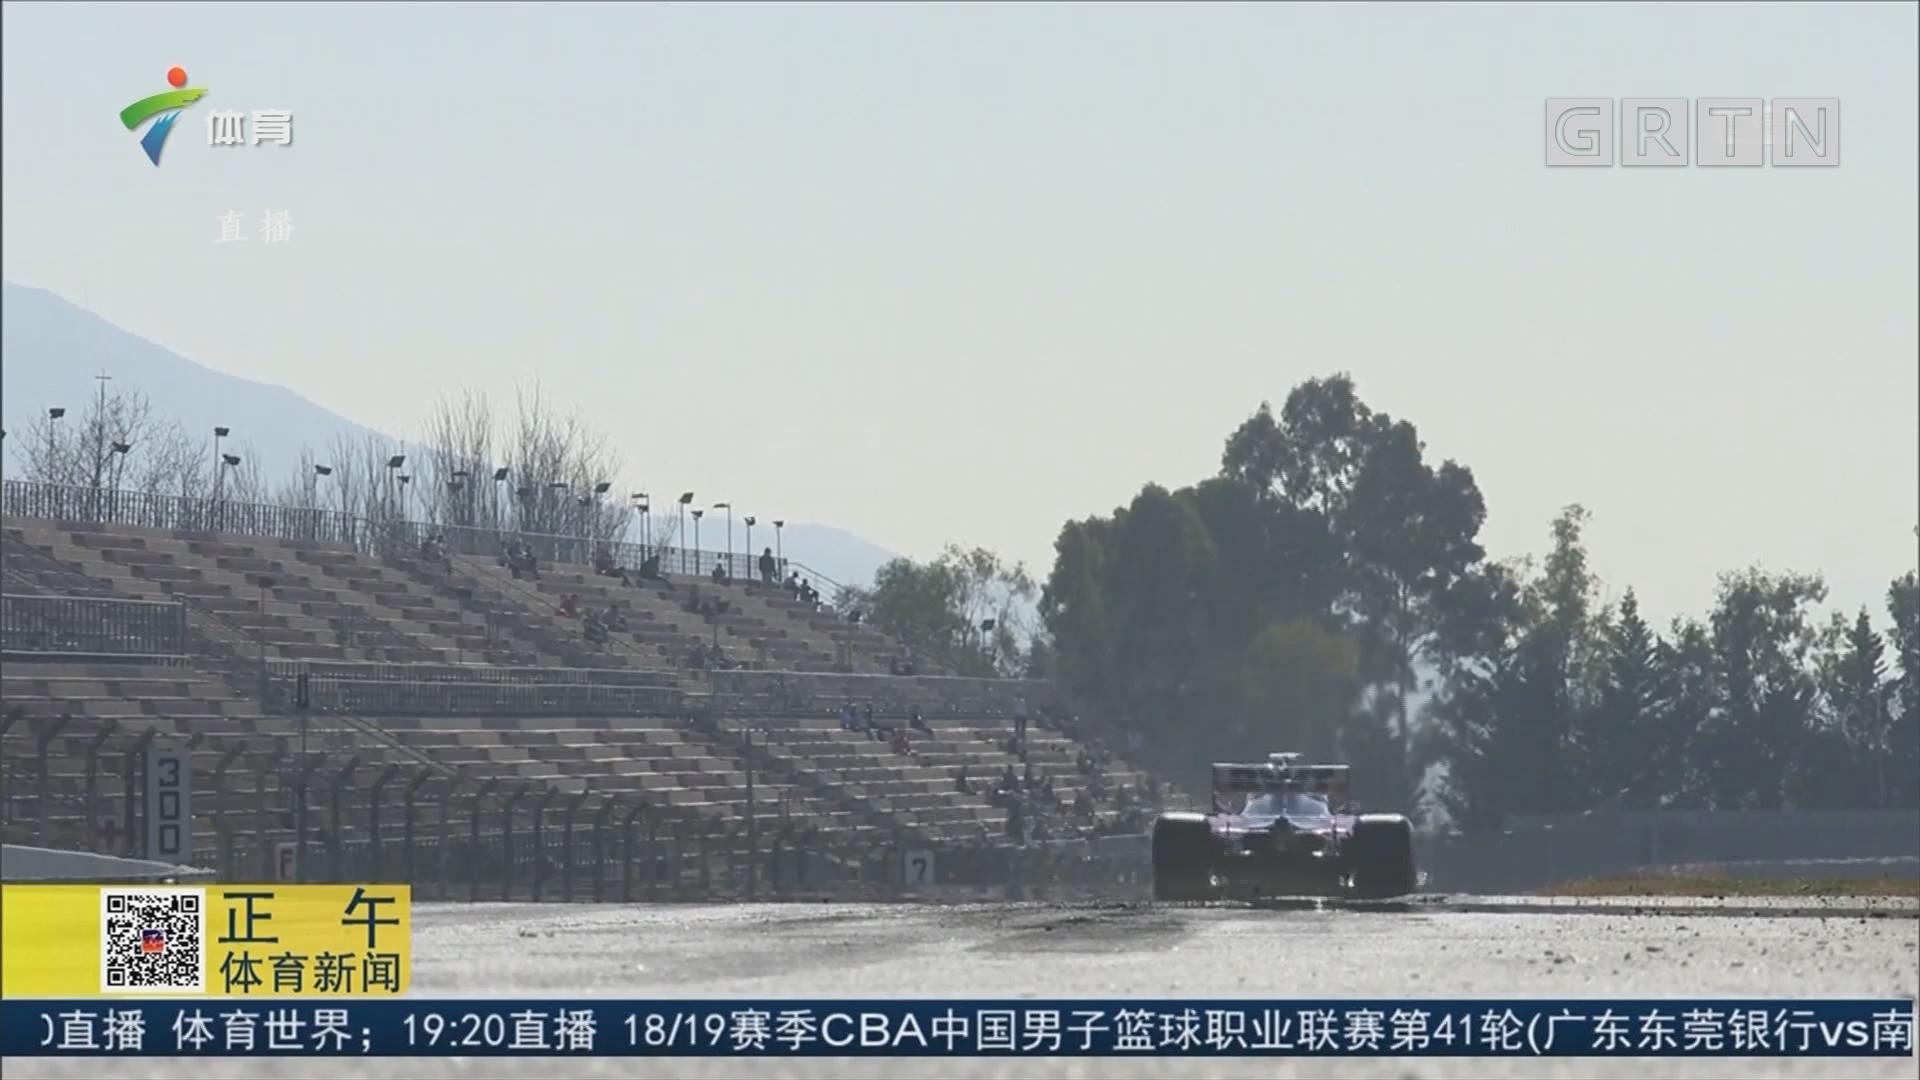 F1巴塞罗那试车 赛恩斯领跑 维特尔撞车